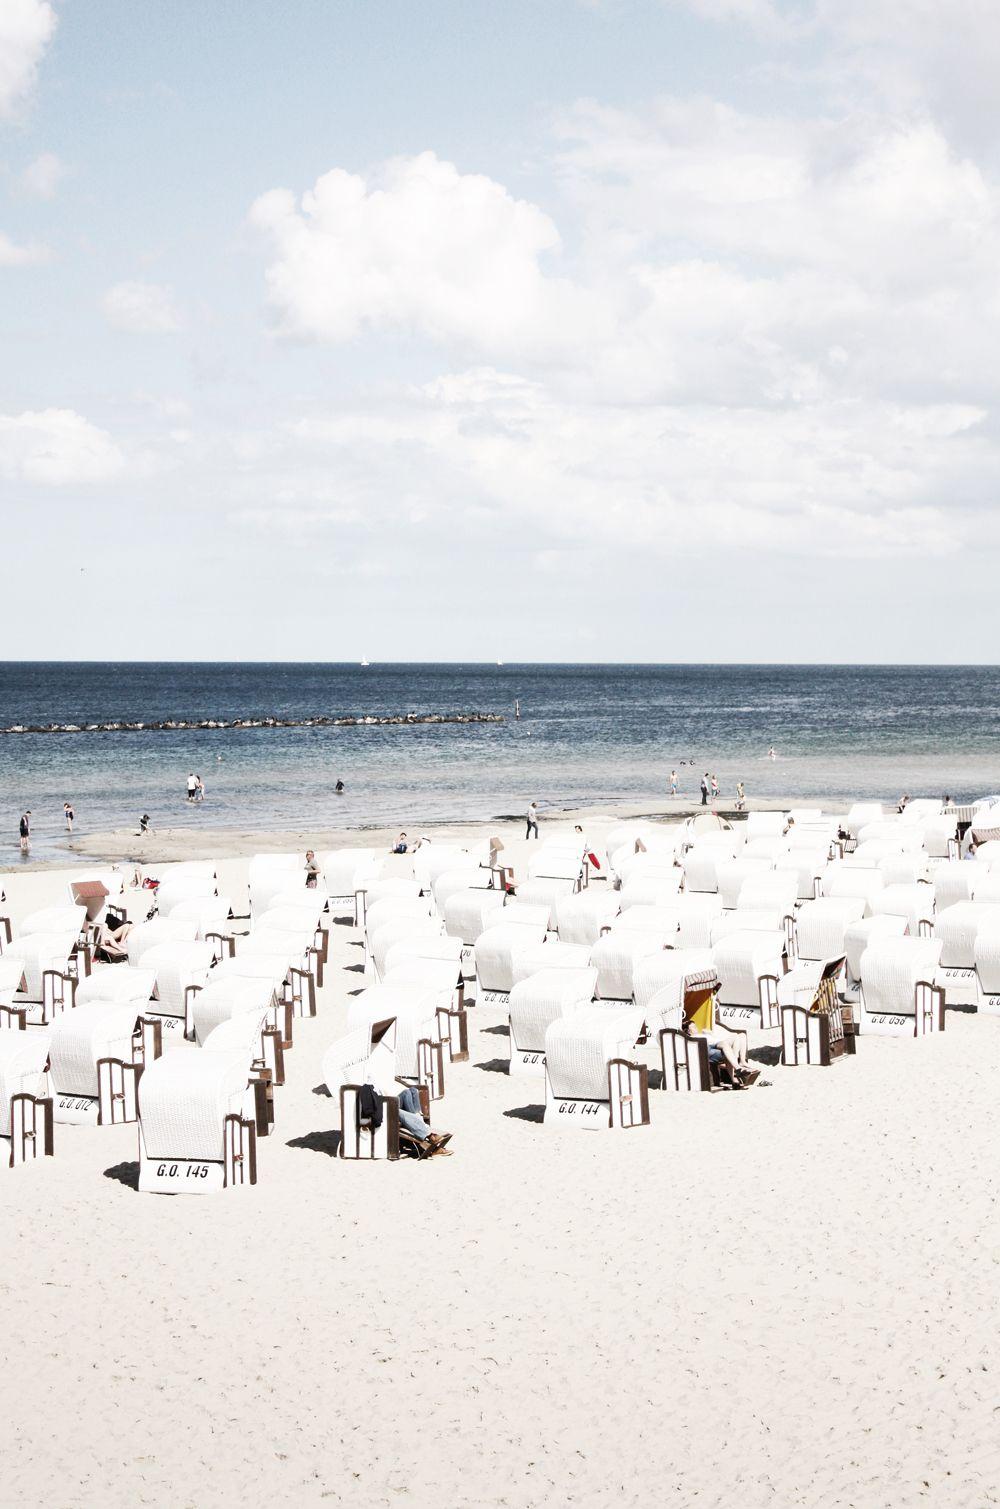 Travel Germany S Largest Island Ruegen In The Pomeranian Coast In The Baltic Sea Designsetter Design Lifestyle And Interior Design Magazine Baltic Sea Beach Trip Travel